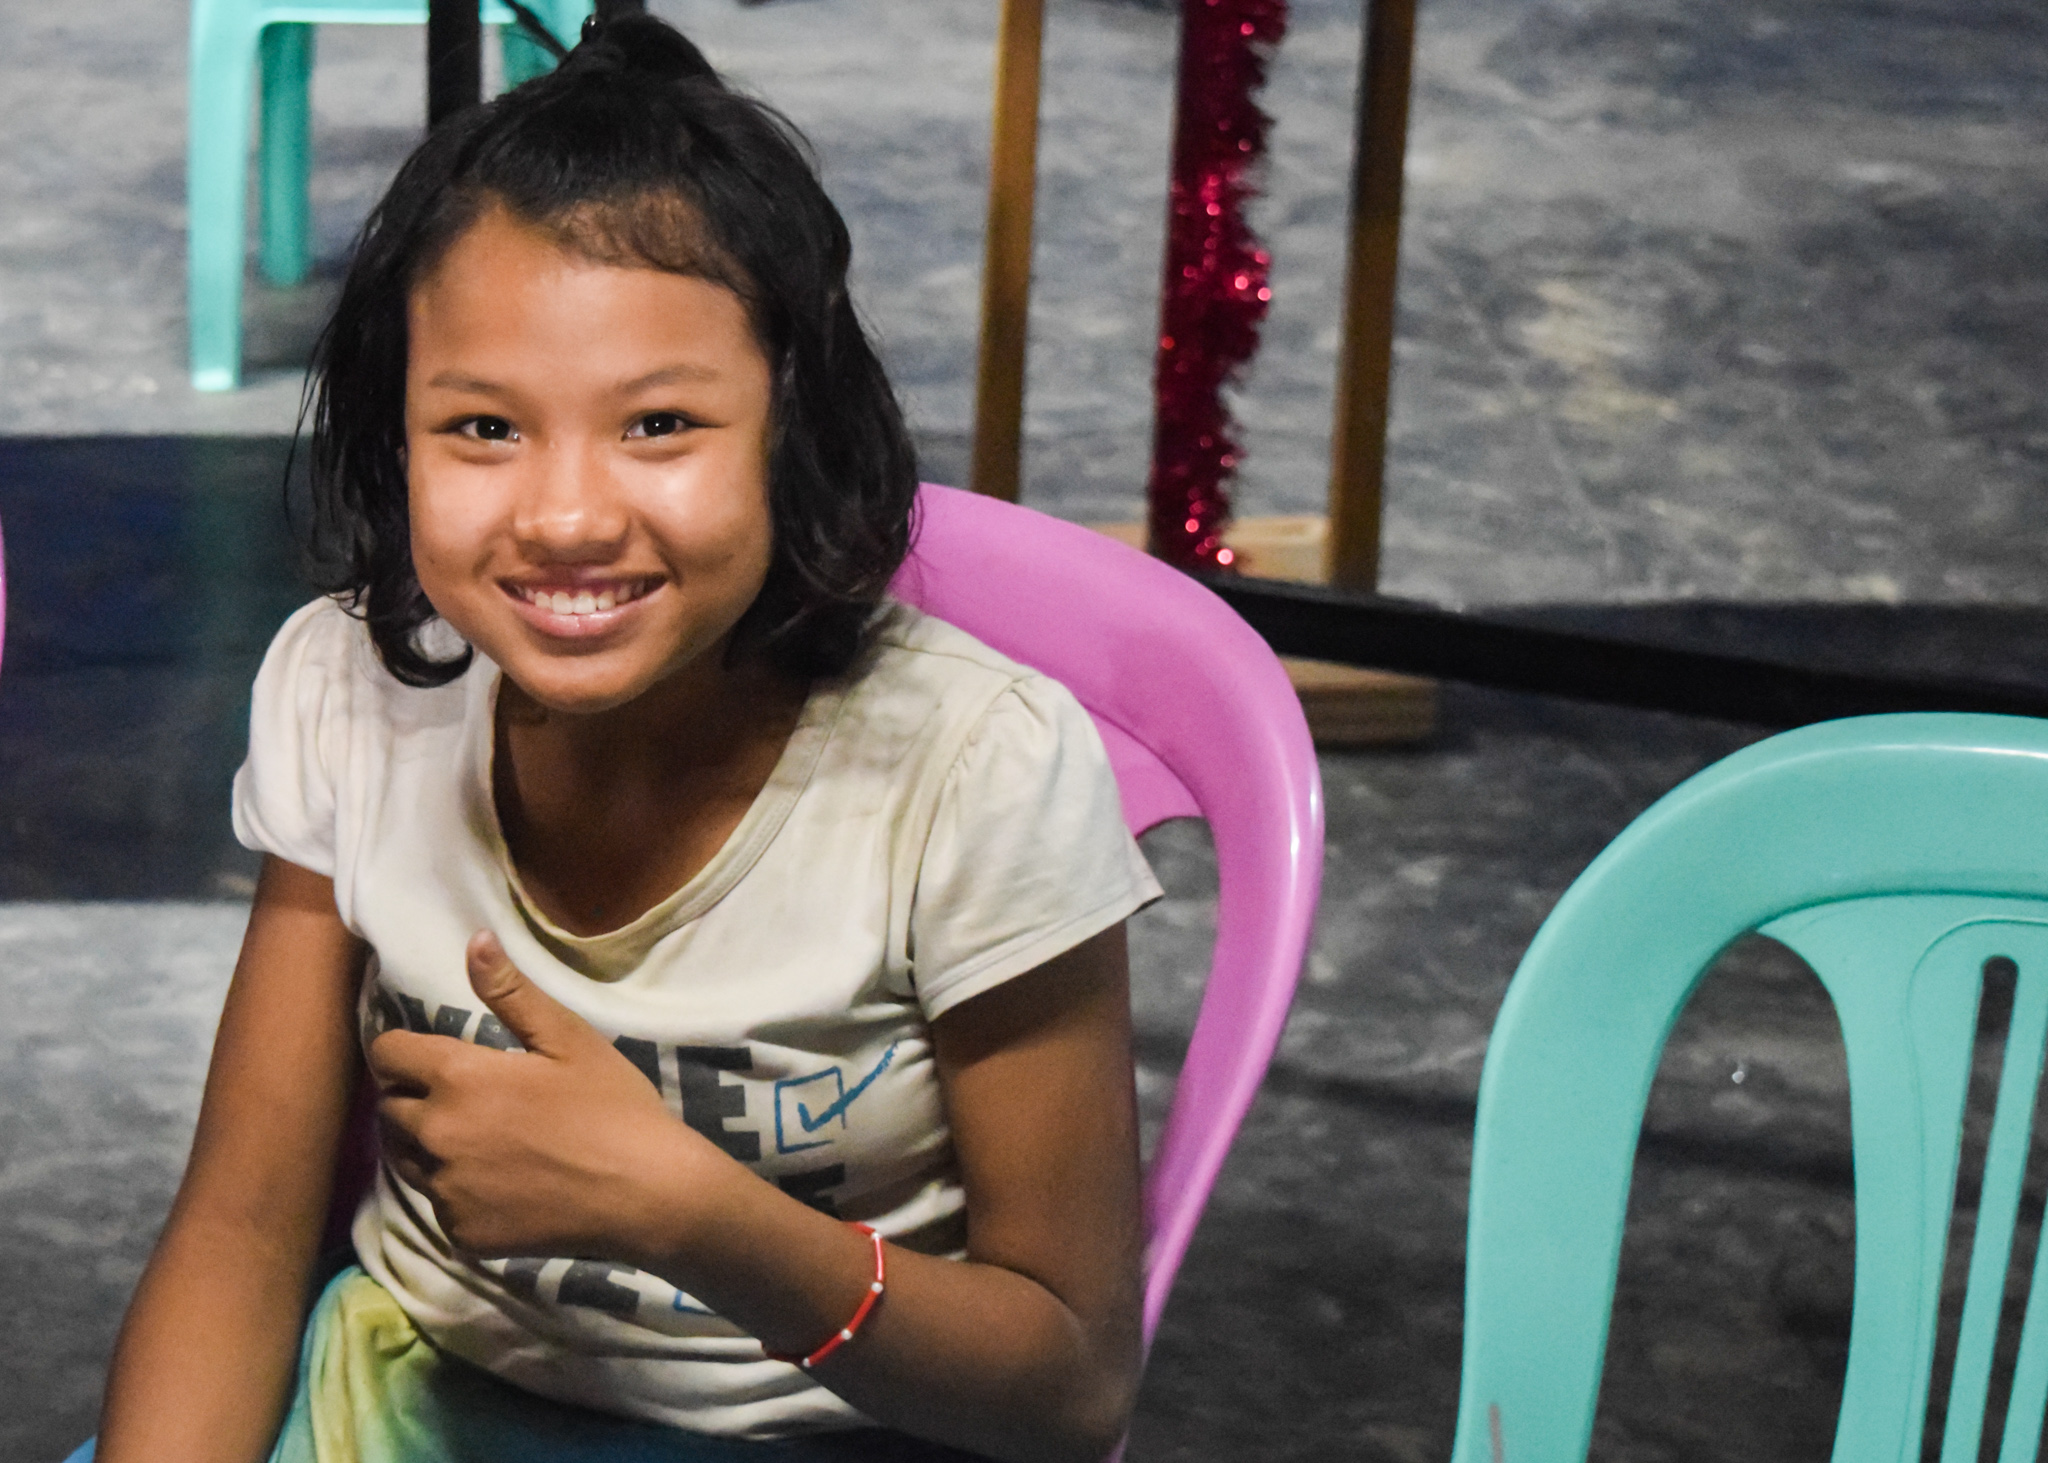 AMG International Sends Help as Myanmar Violence Continues